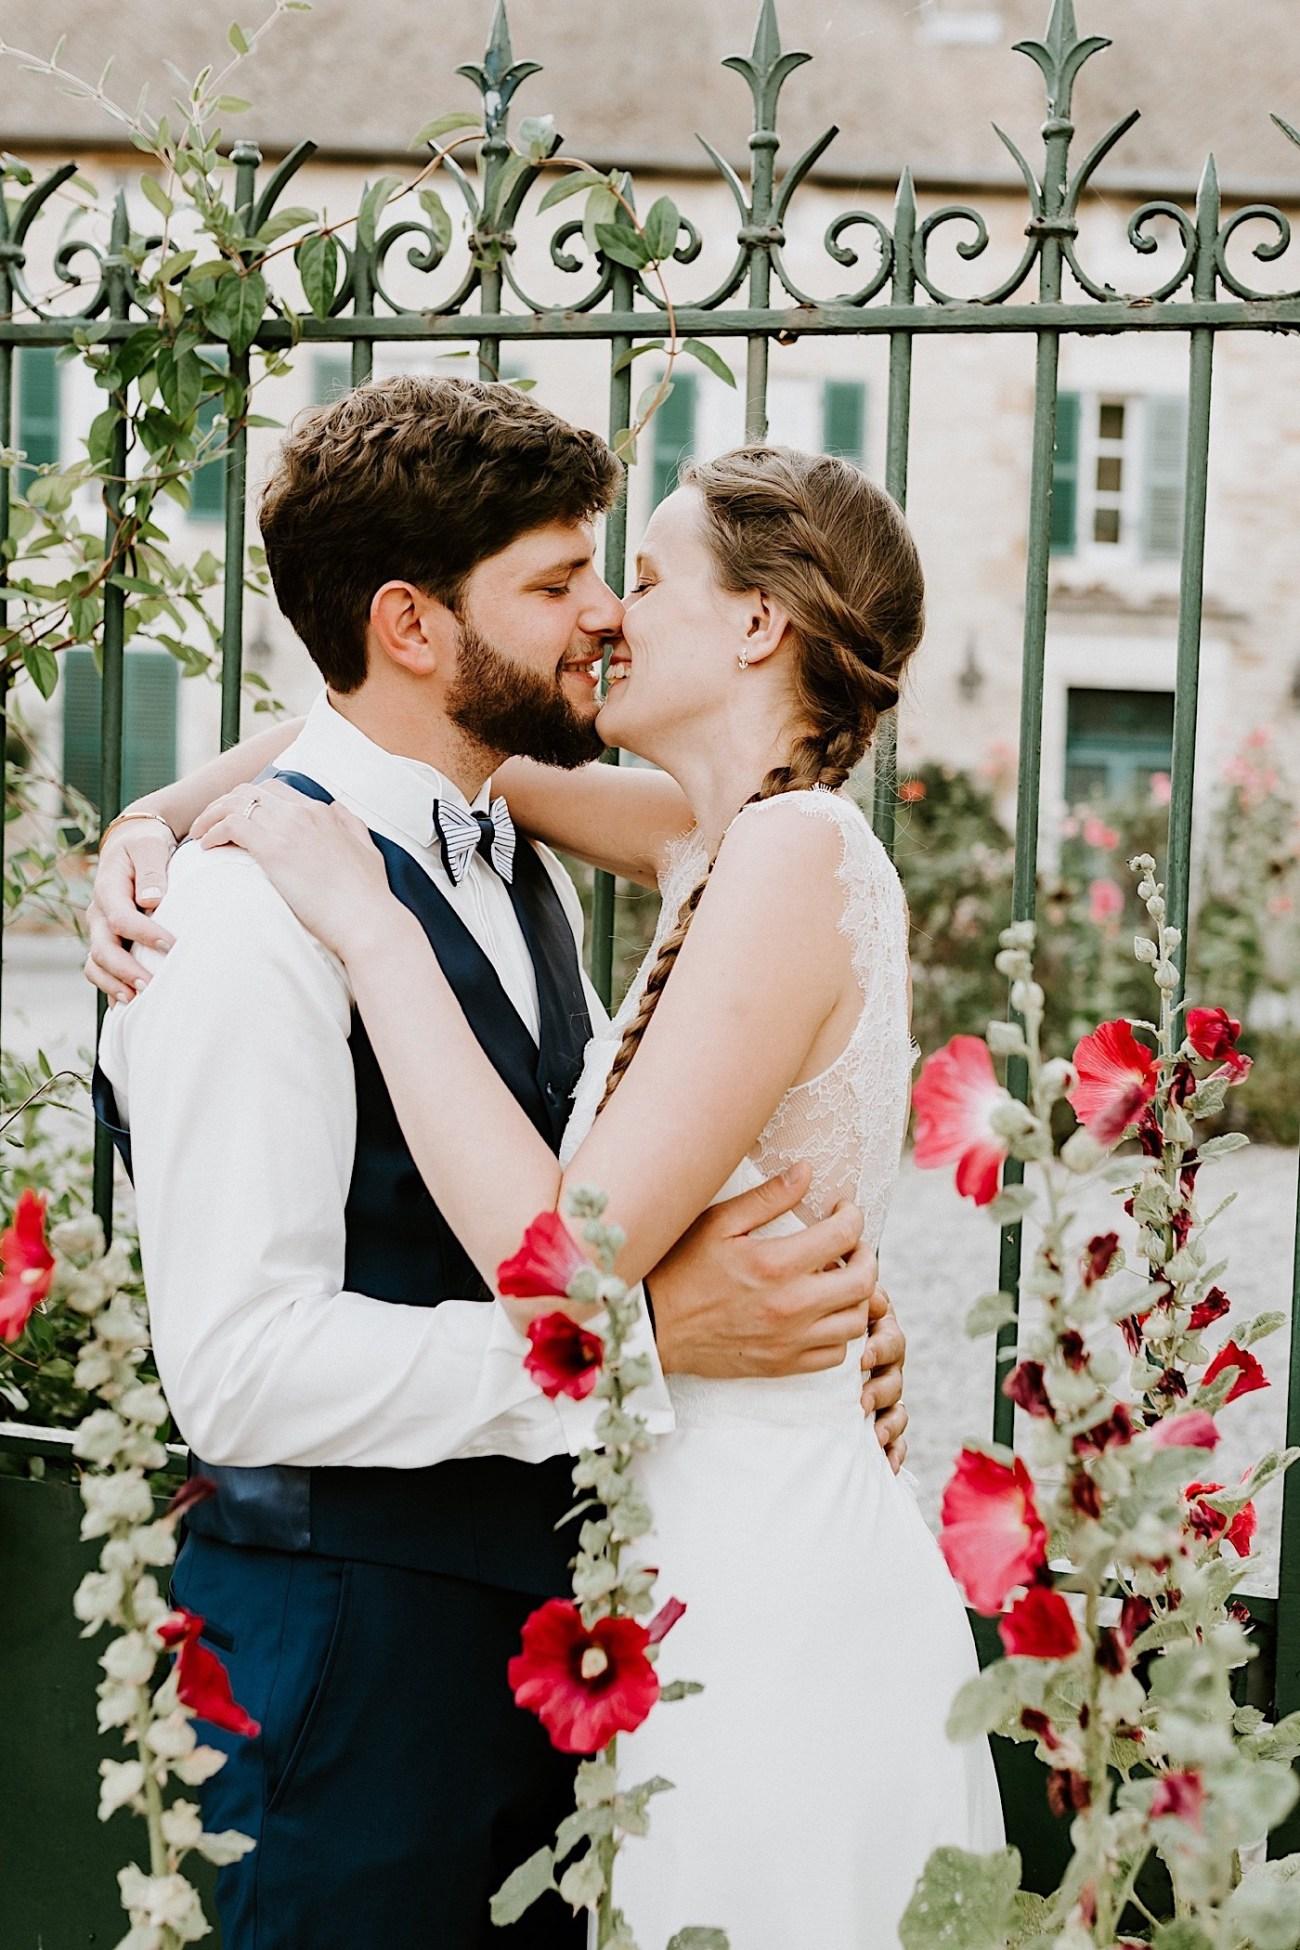 French Rural Wedding After Wedding Day Photos Paris Wedding Photographer 006